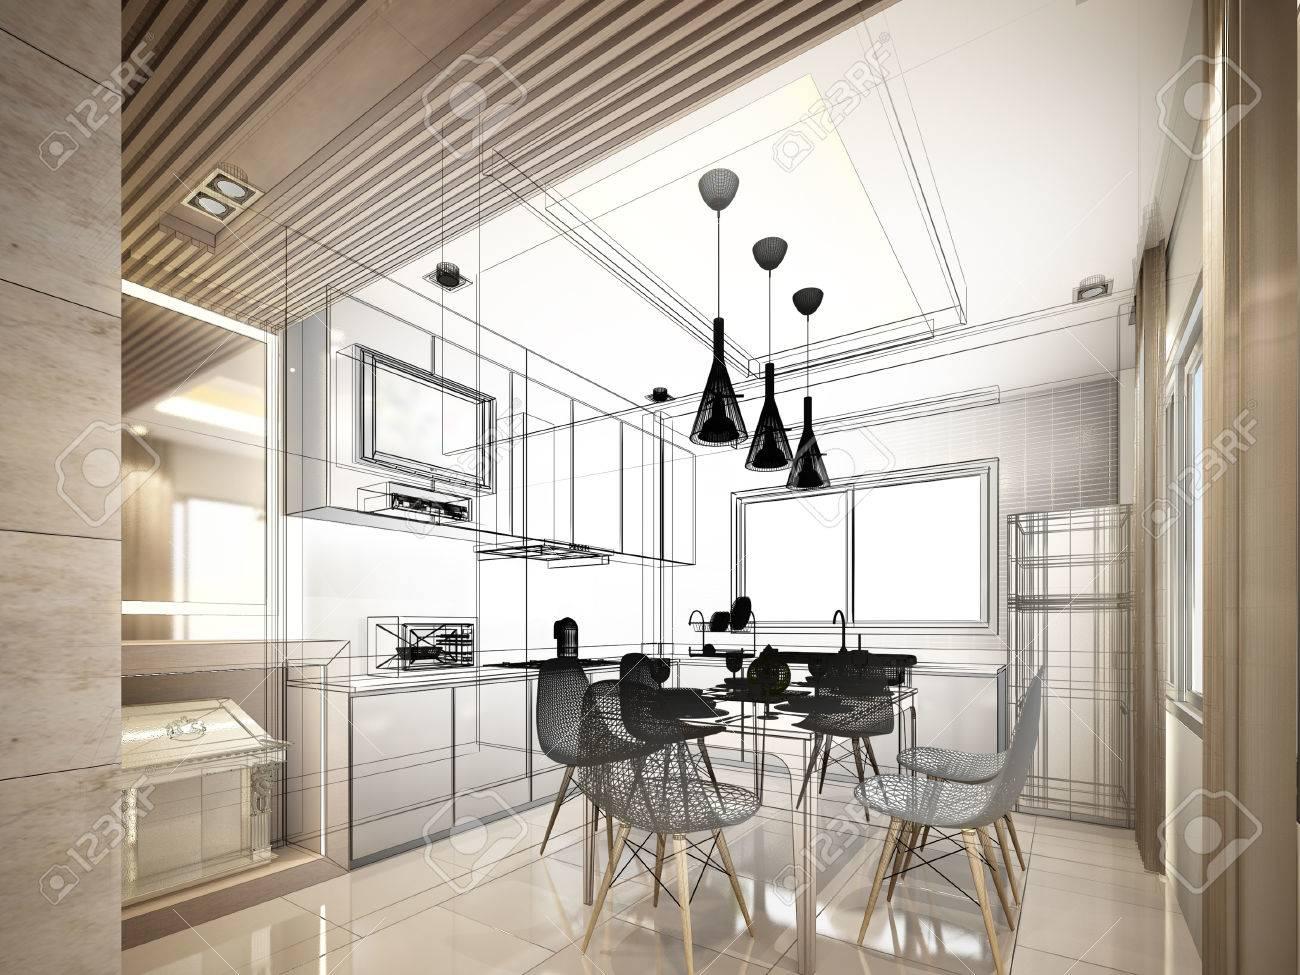 abstract sketch design of interior kitchen - 40904820